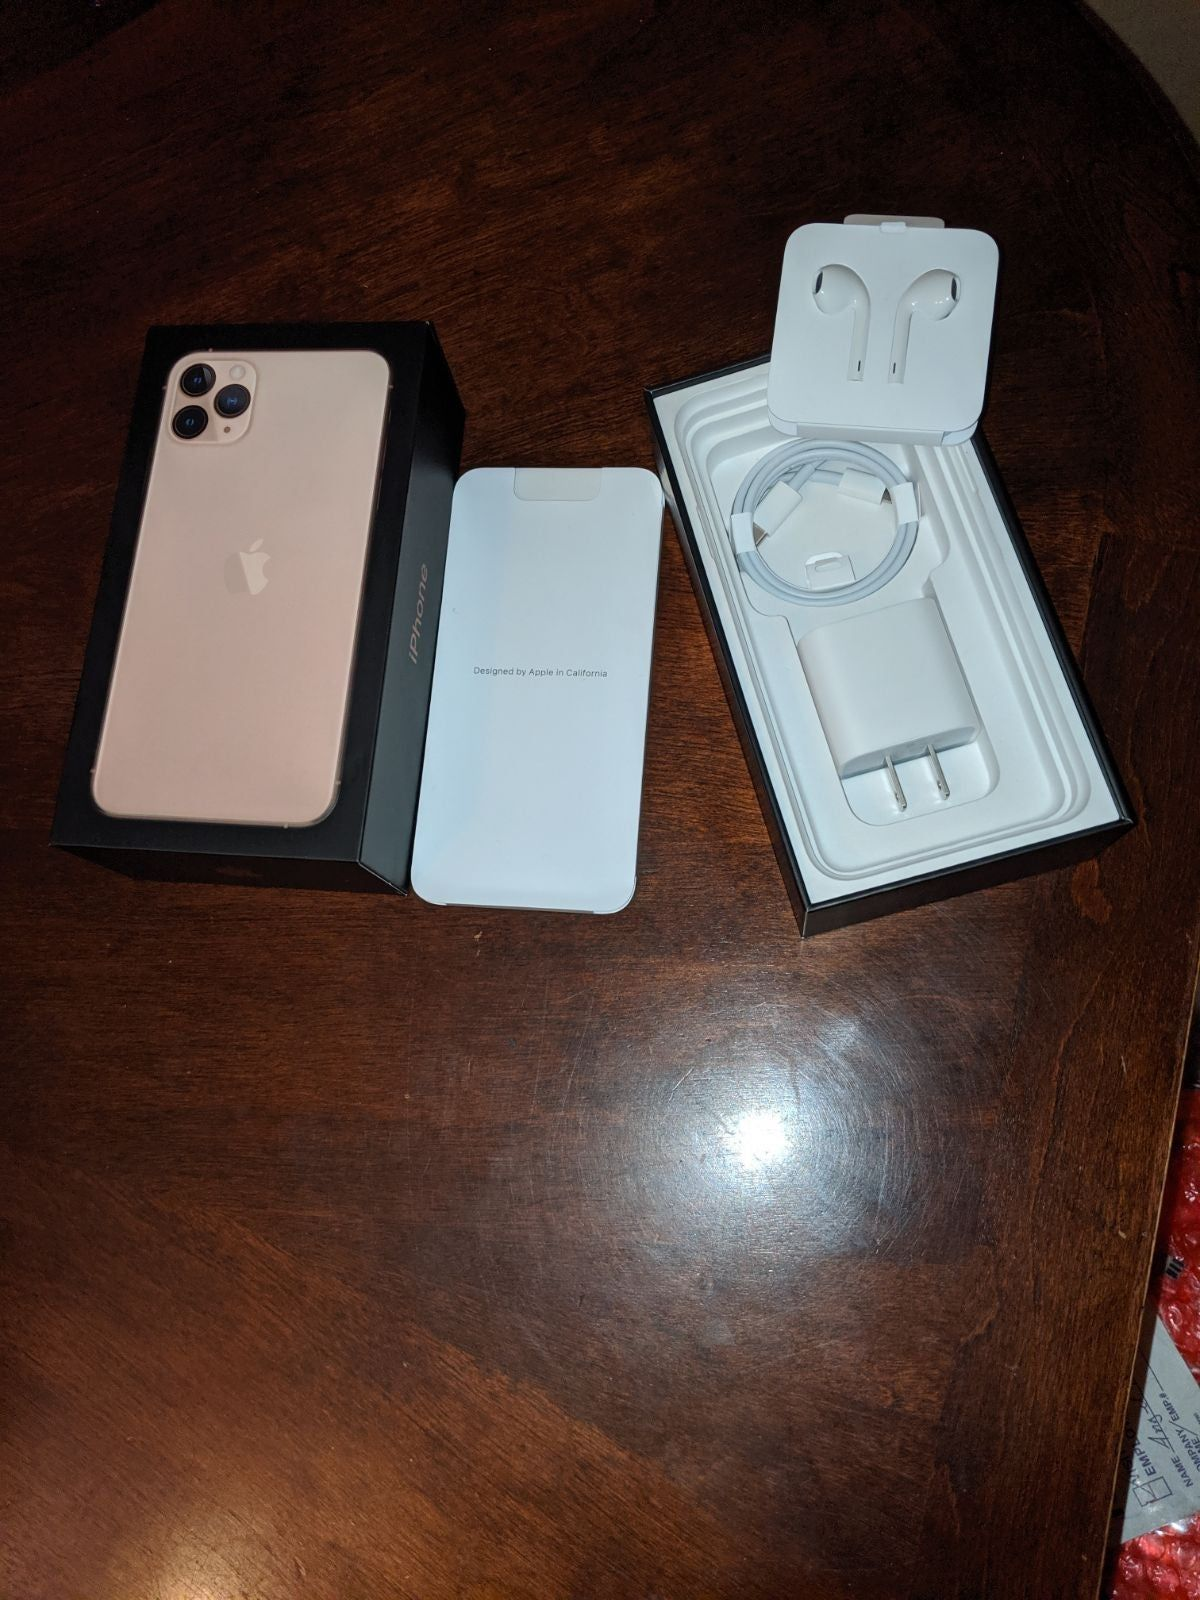 Pin By Anastasiacibulska On Jaime Apple Iphone Accessories Iphone 11 Pro Max Box Iphone